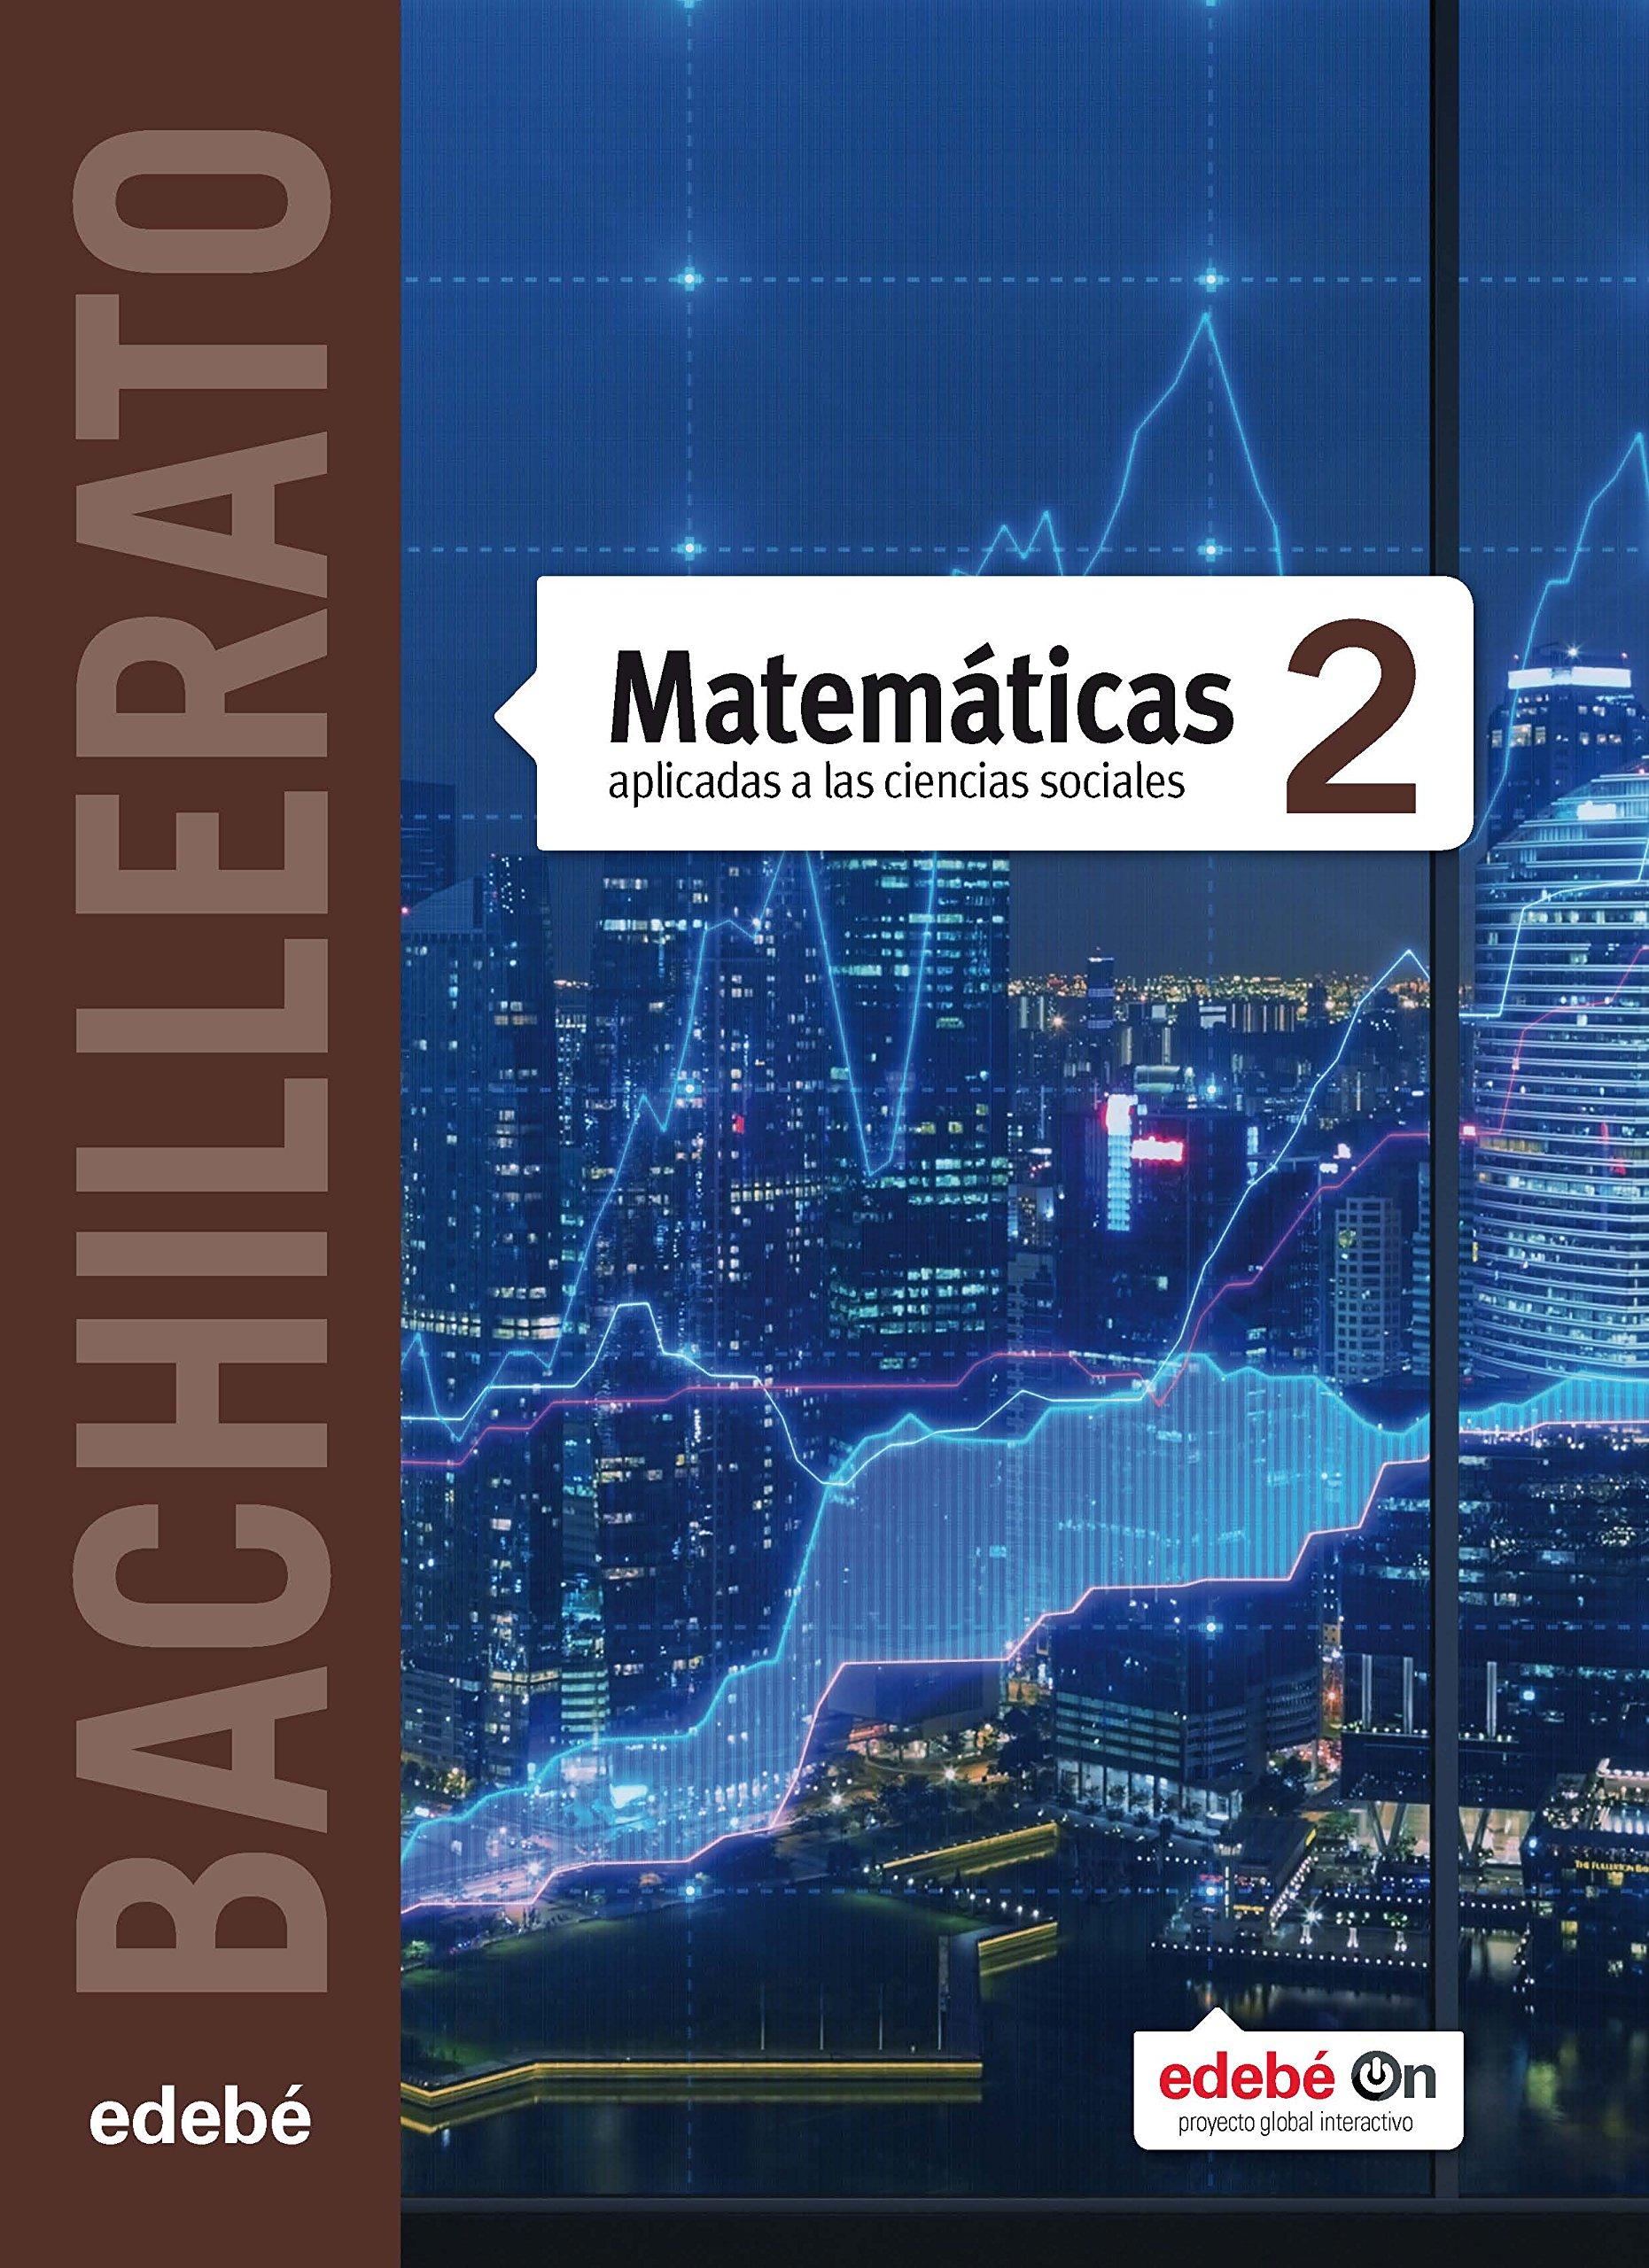 MATEMATICAS CCSS TX2 (CAS) - 9788468316581: Amazon.es: Edebé, Obra Colectiva: Libros